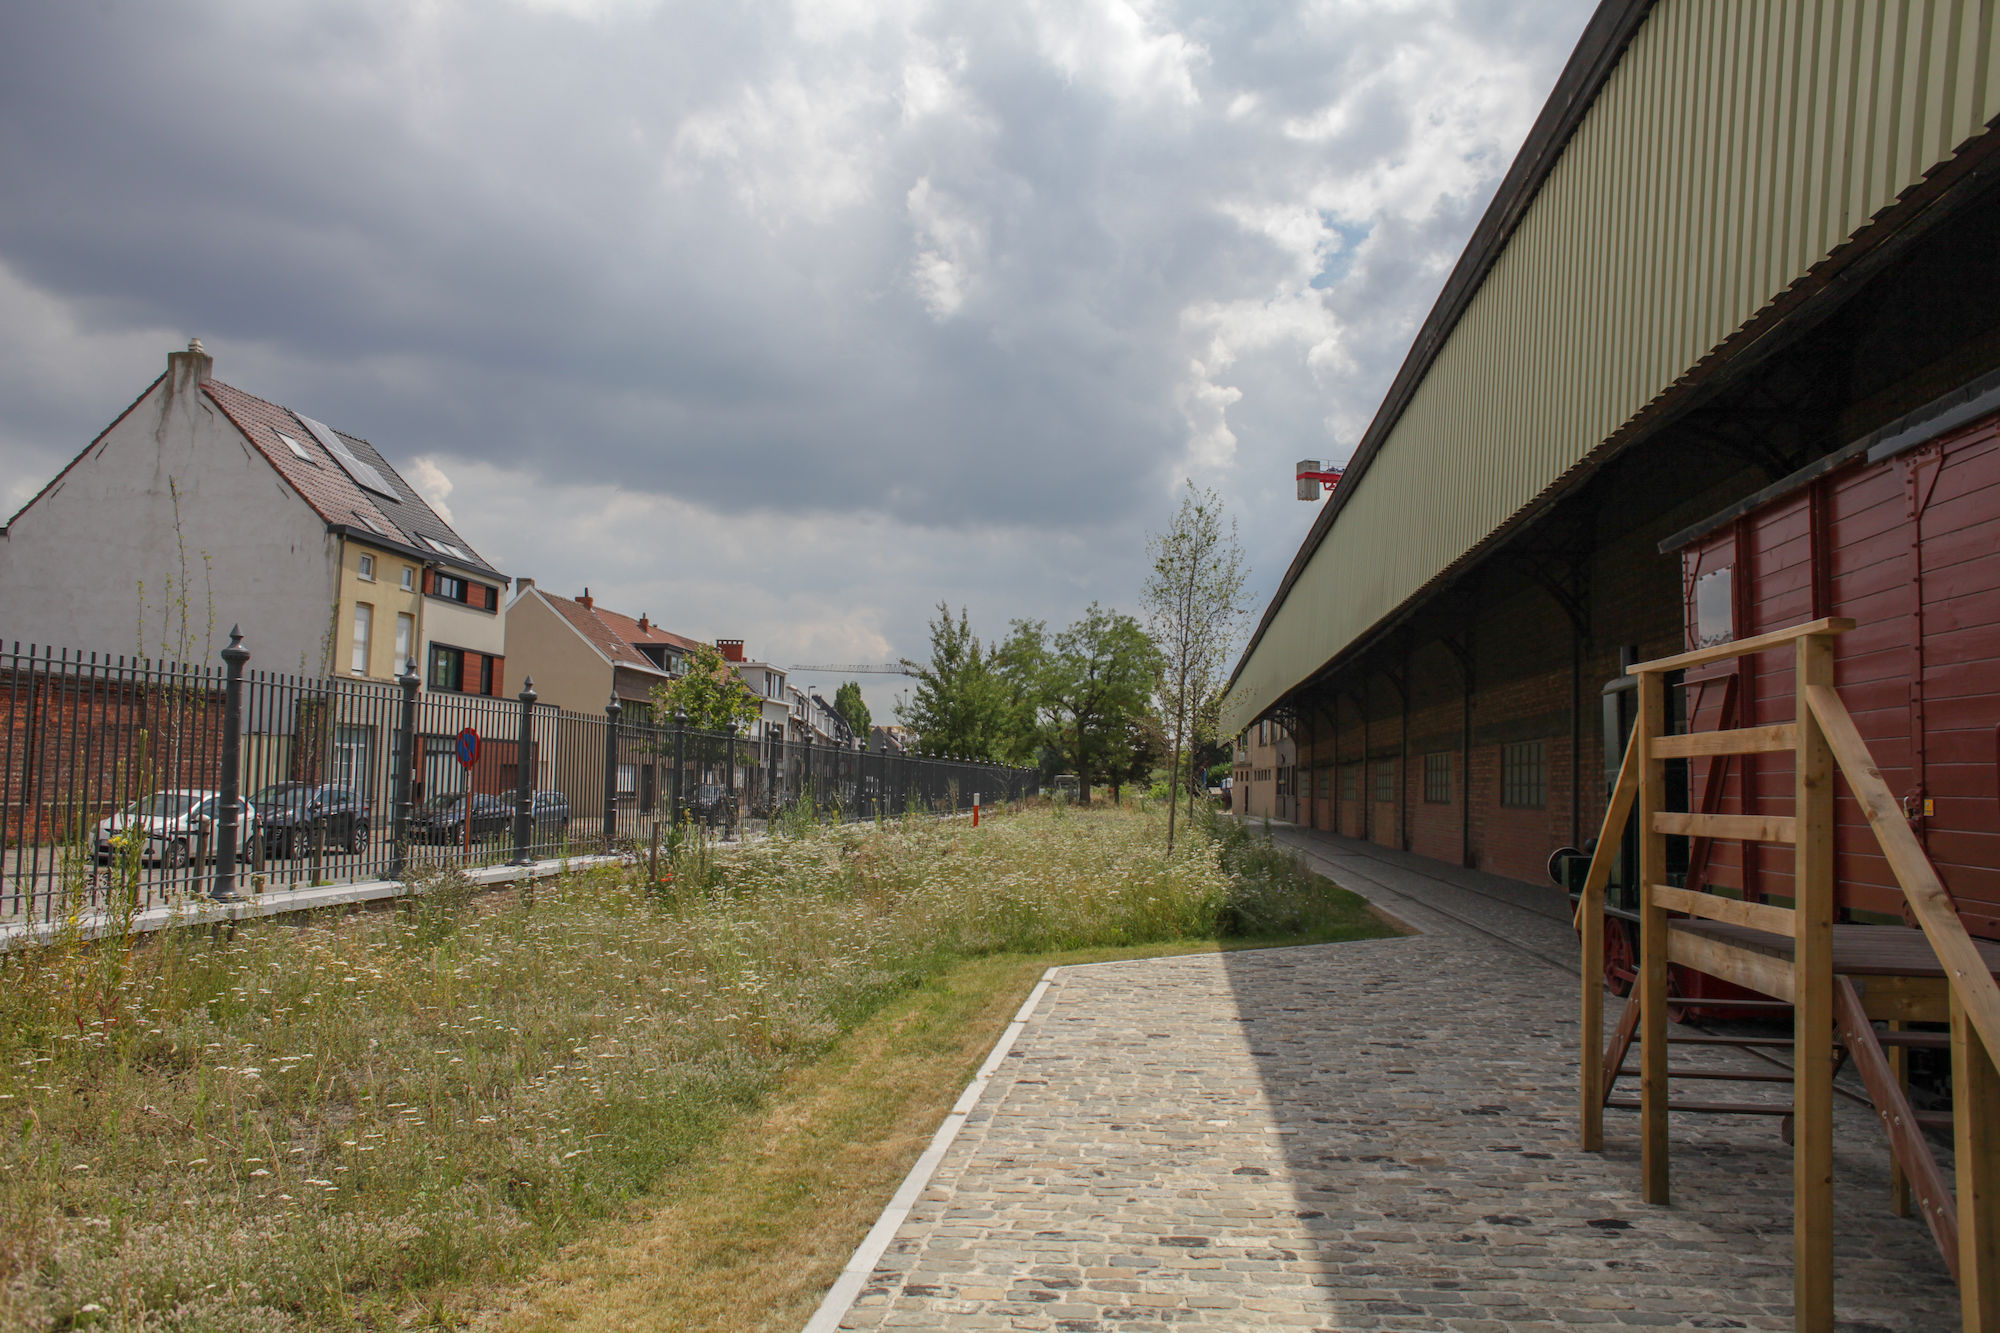 2019-07-02 Muide Meulestede prospectie Wannes_stadsvernieuwing_IMG_0397-2.jpg